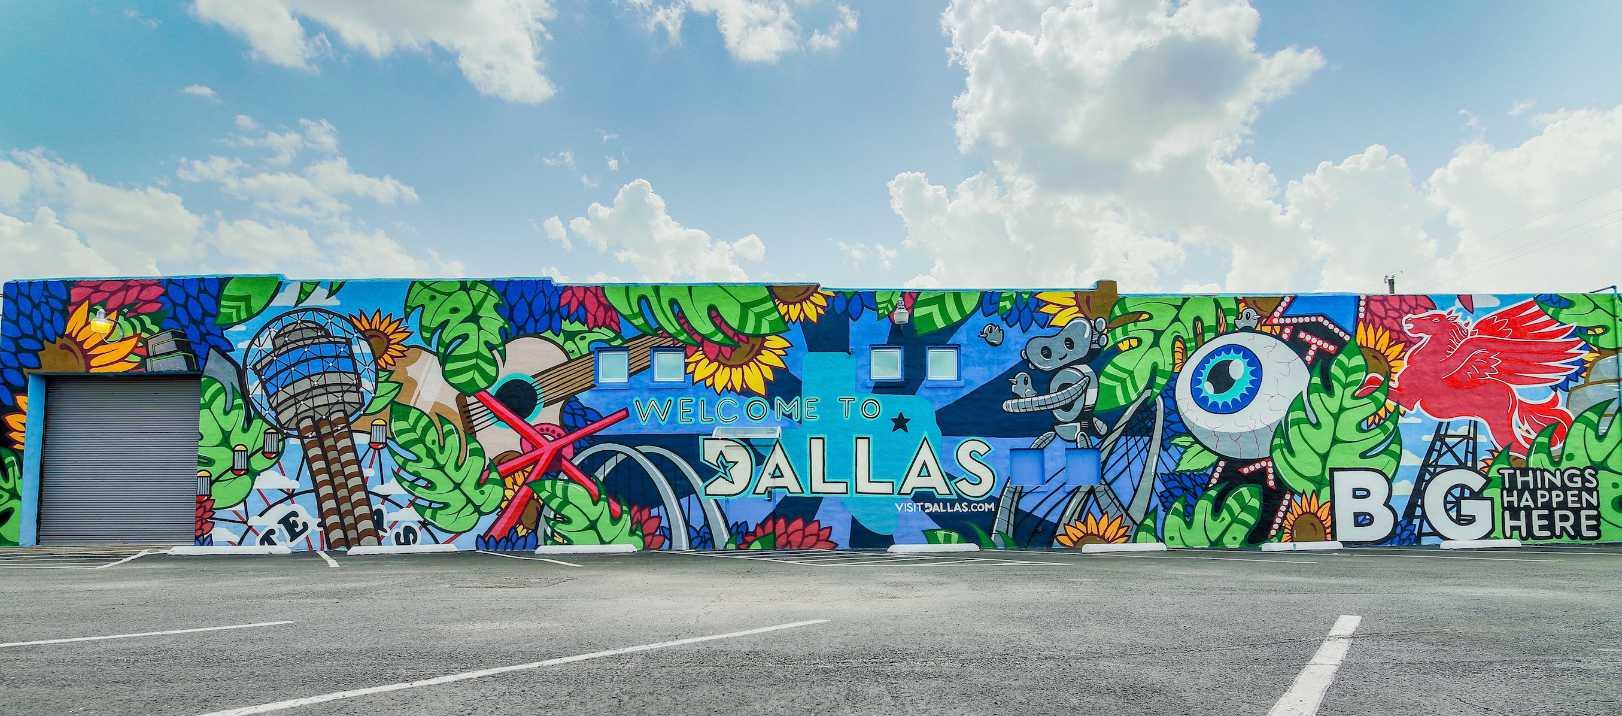 VisitDallas mural.